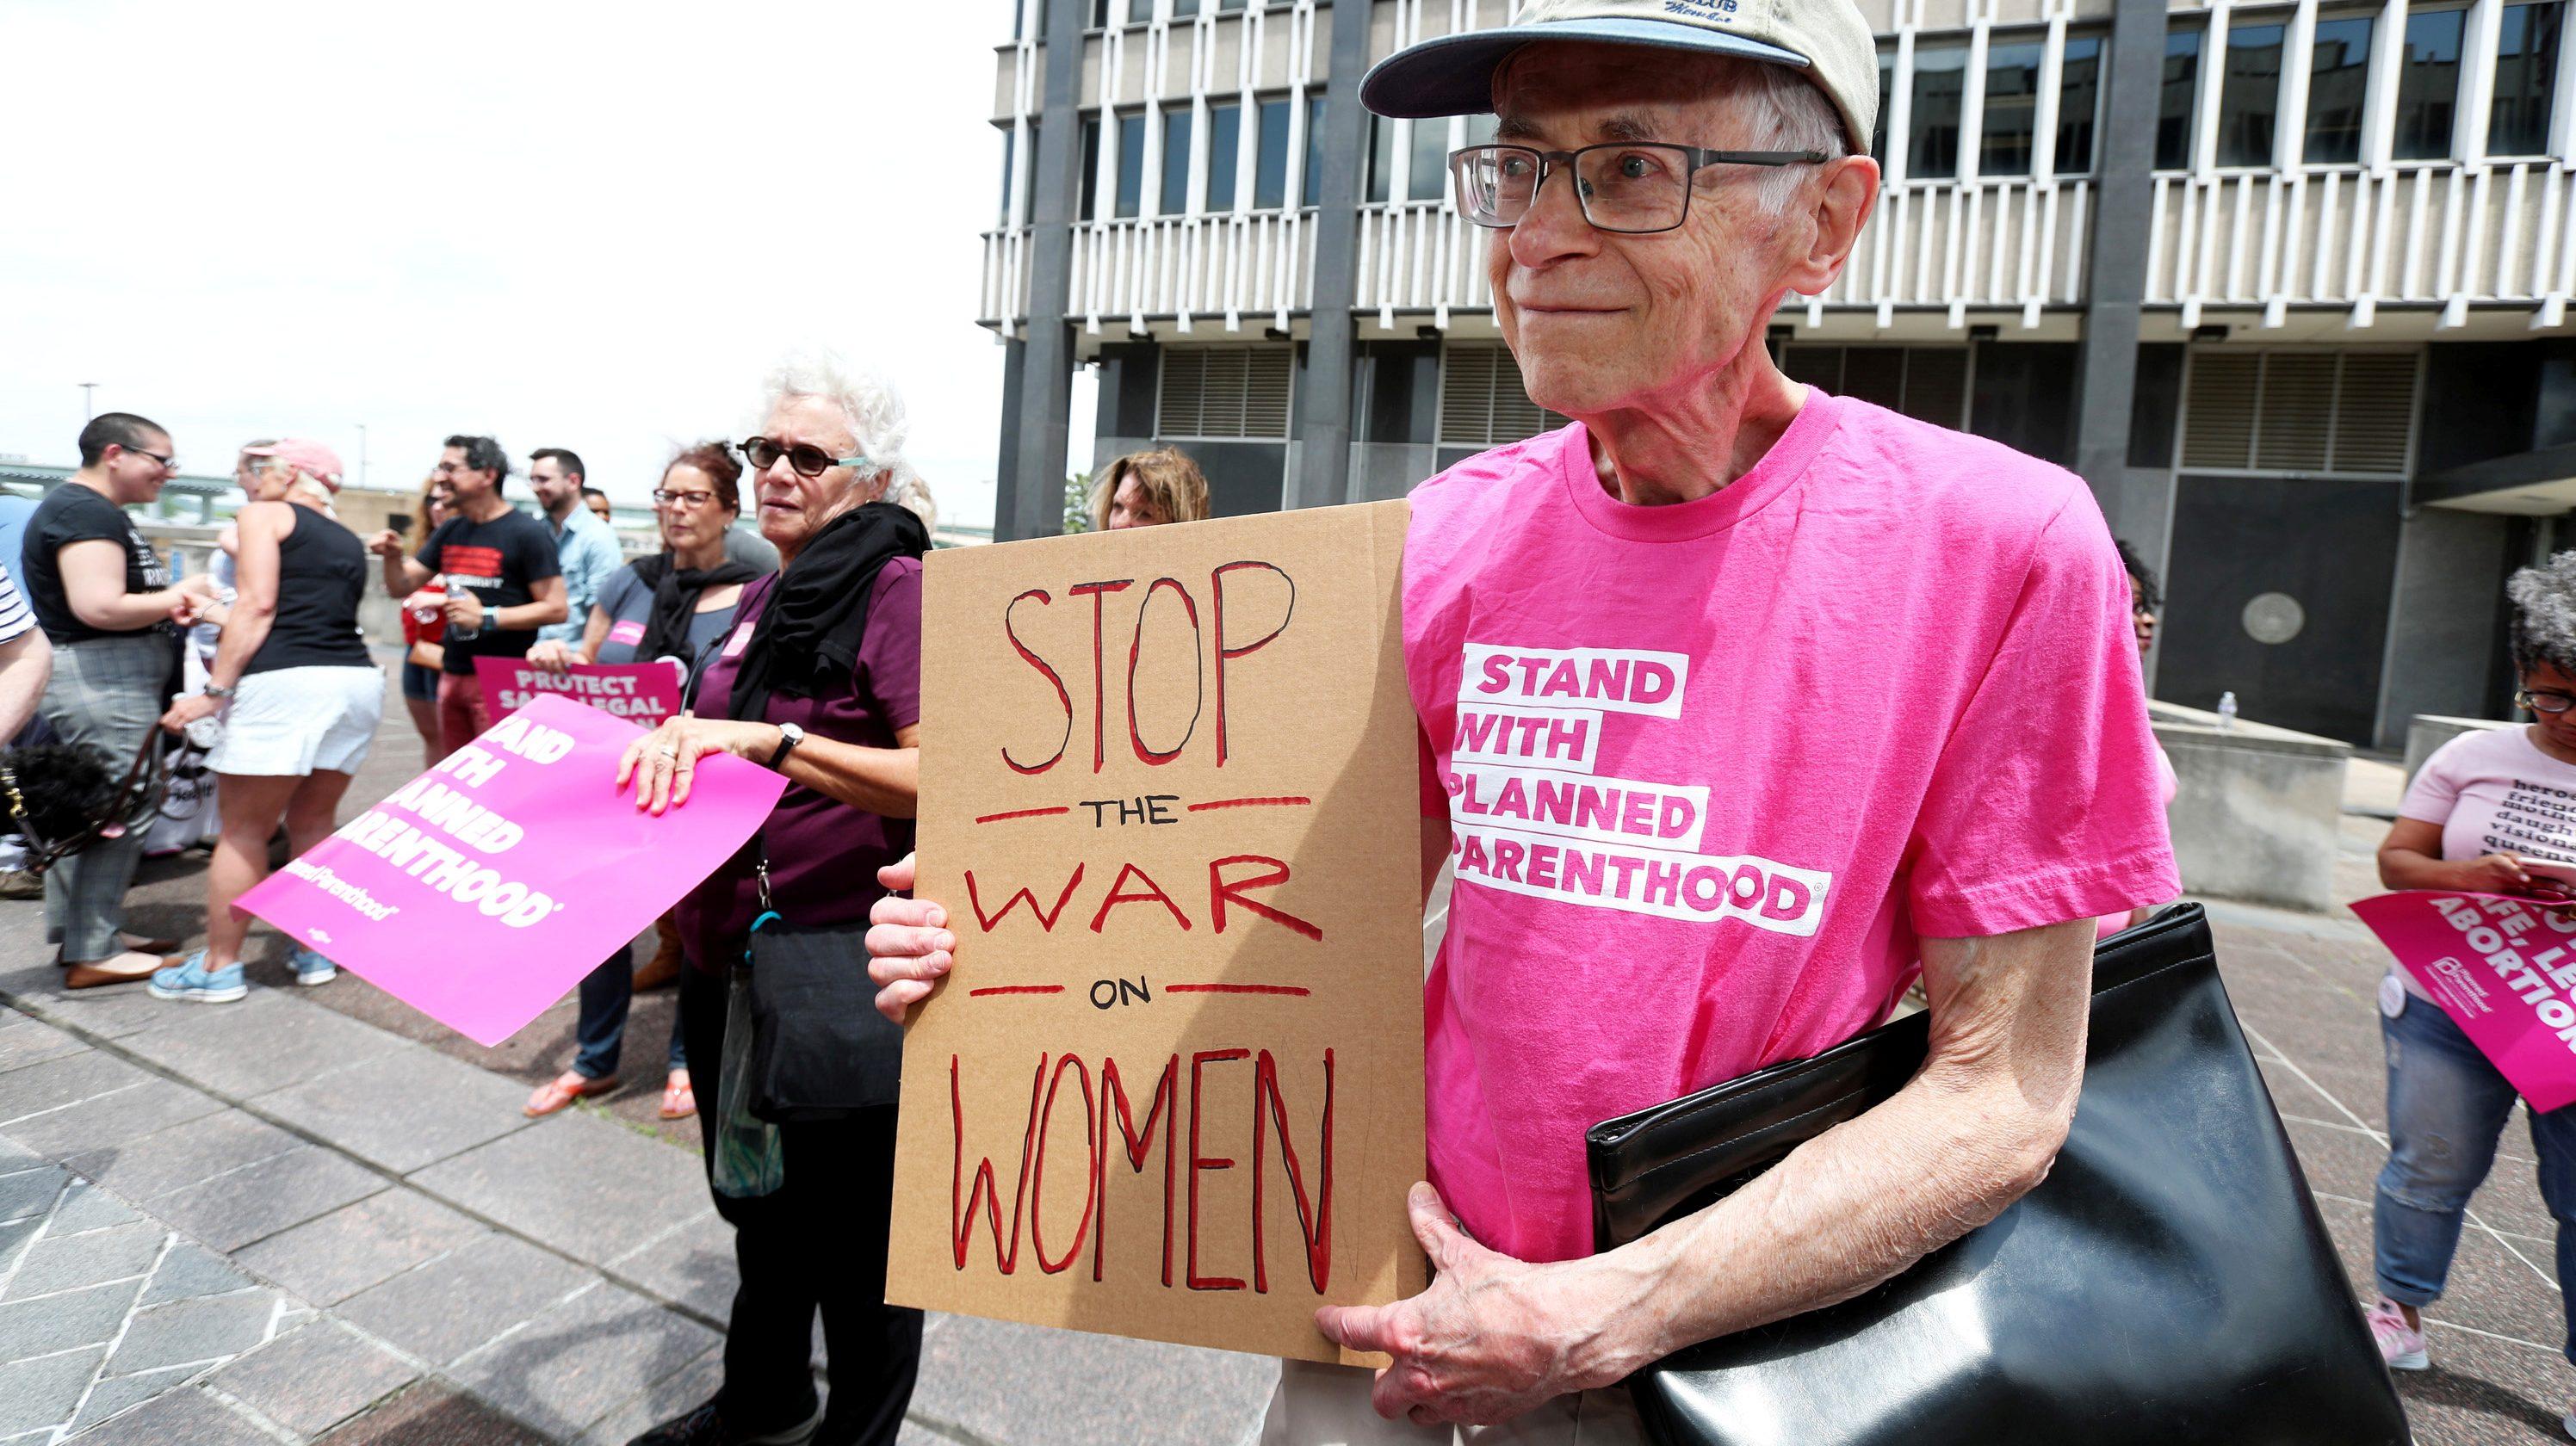 A pro-choice activist holding a sign